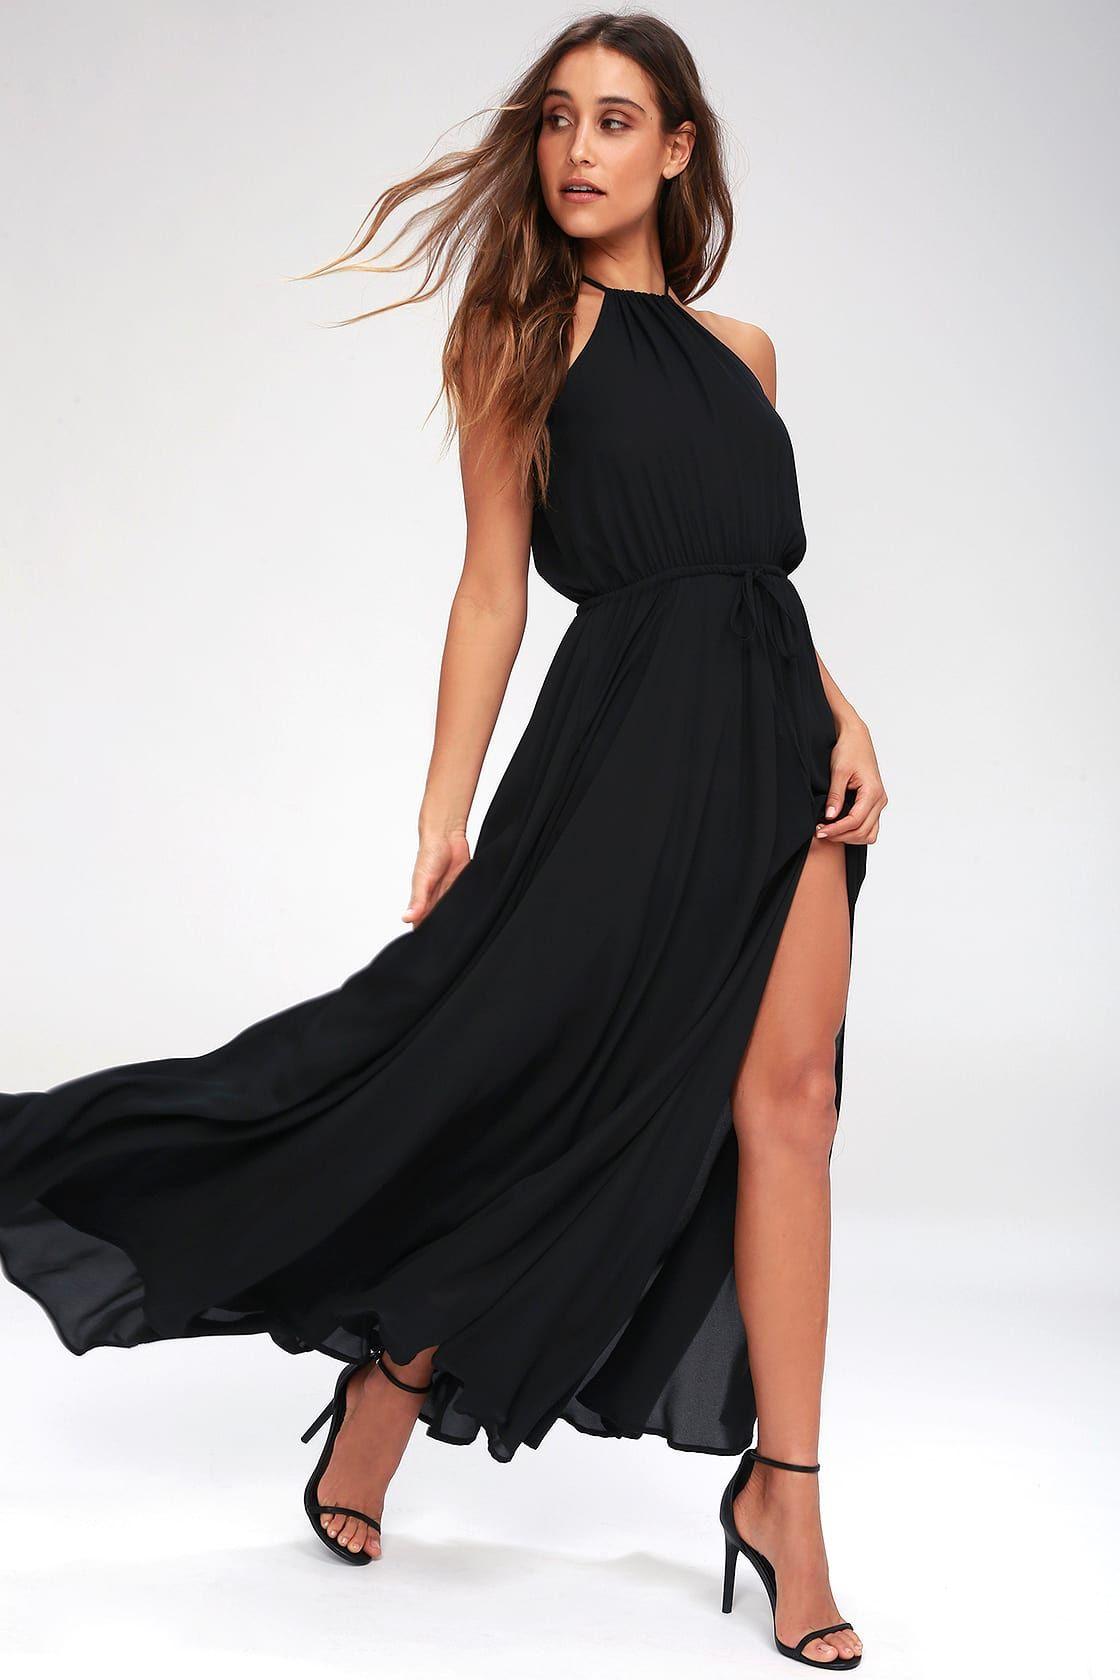 Park Art My WordPress Blog_Black Maxi Dress Casual Outfit